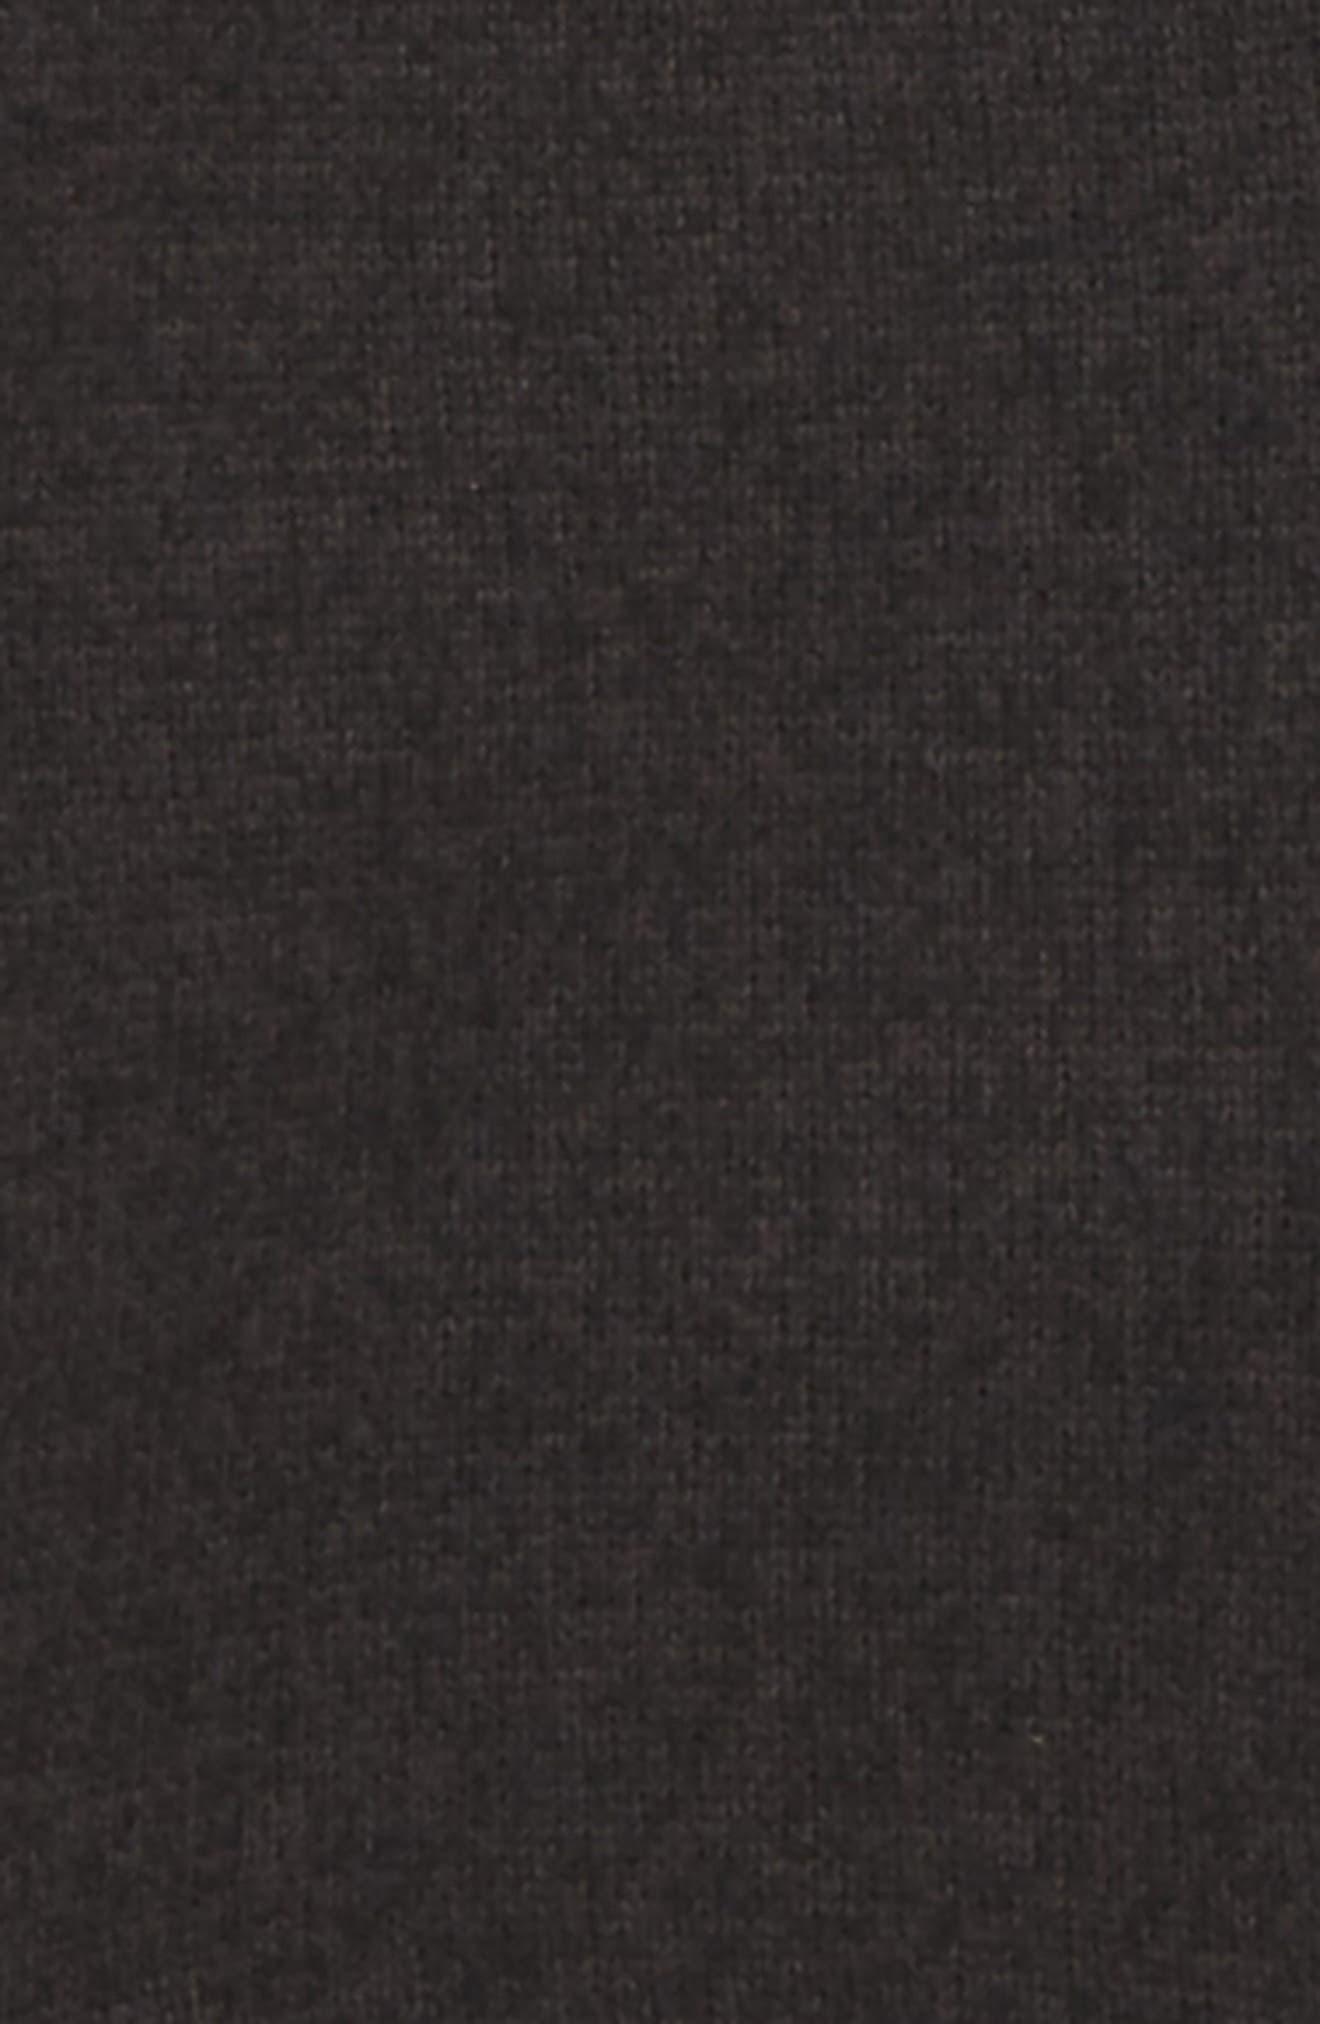 Gordon Lyons Sweater Fleece Zip Jacket,                             Alternate thumbnail 2, color,                             001